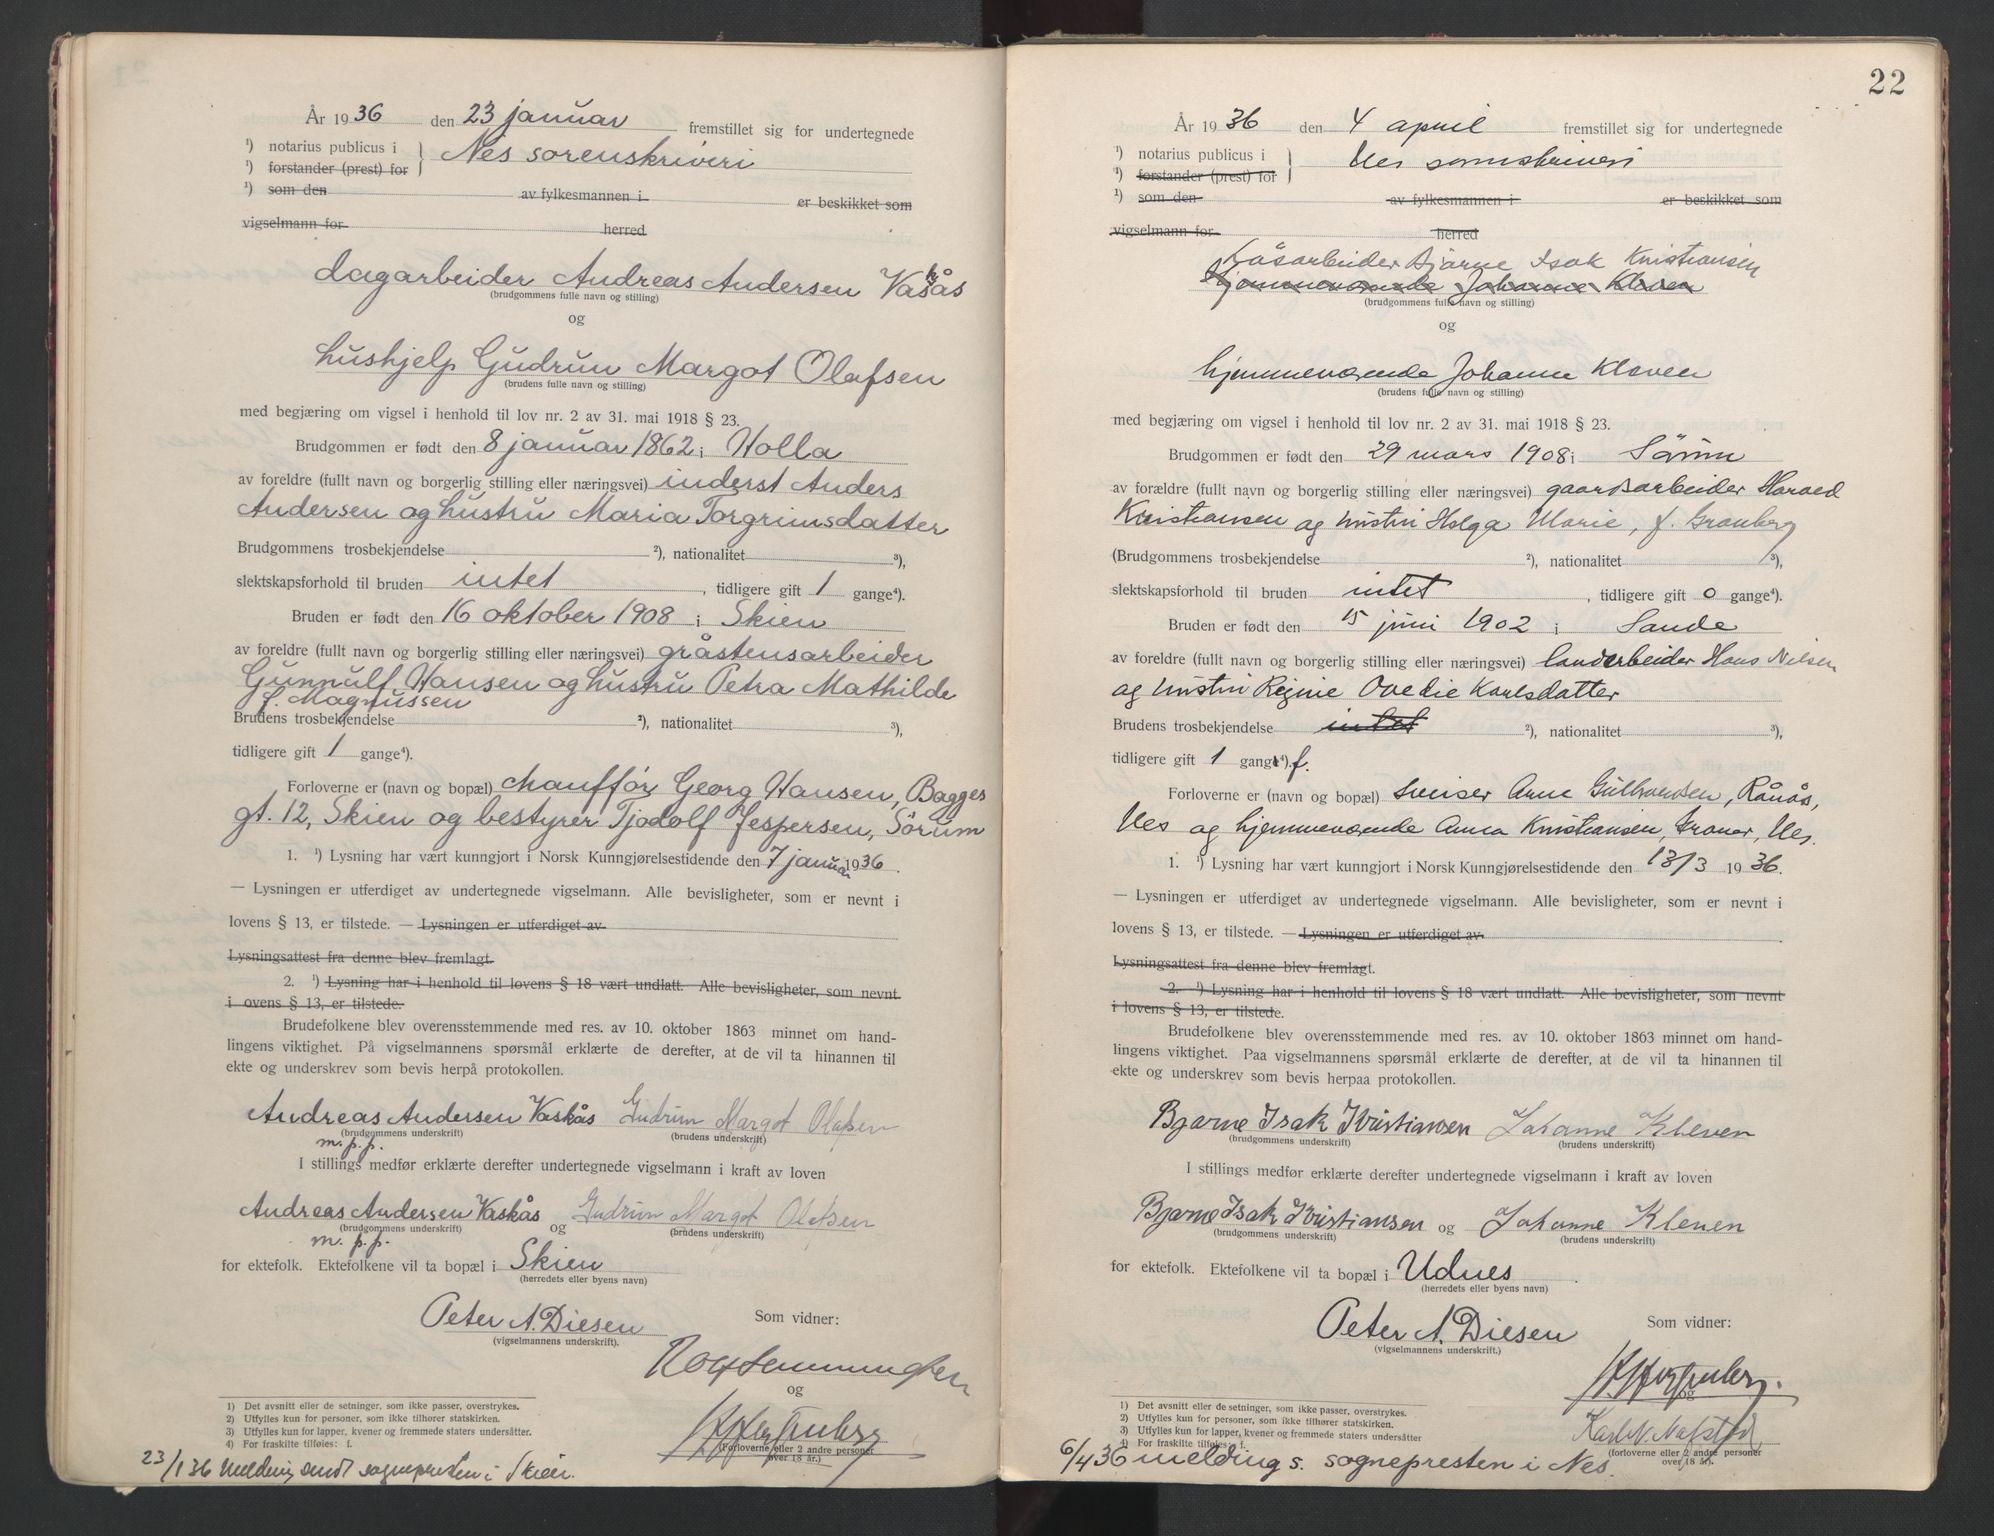 SAO, Nes tingrett, L/Lc/Lca/L0001: Vigselbok, 1920-1943, s. 22